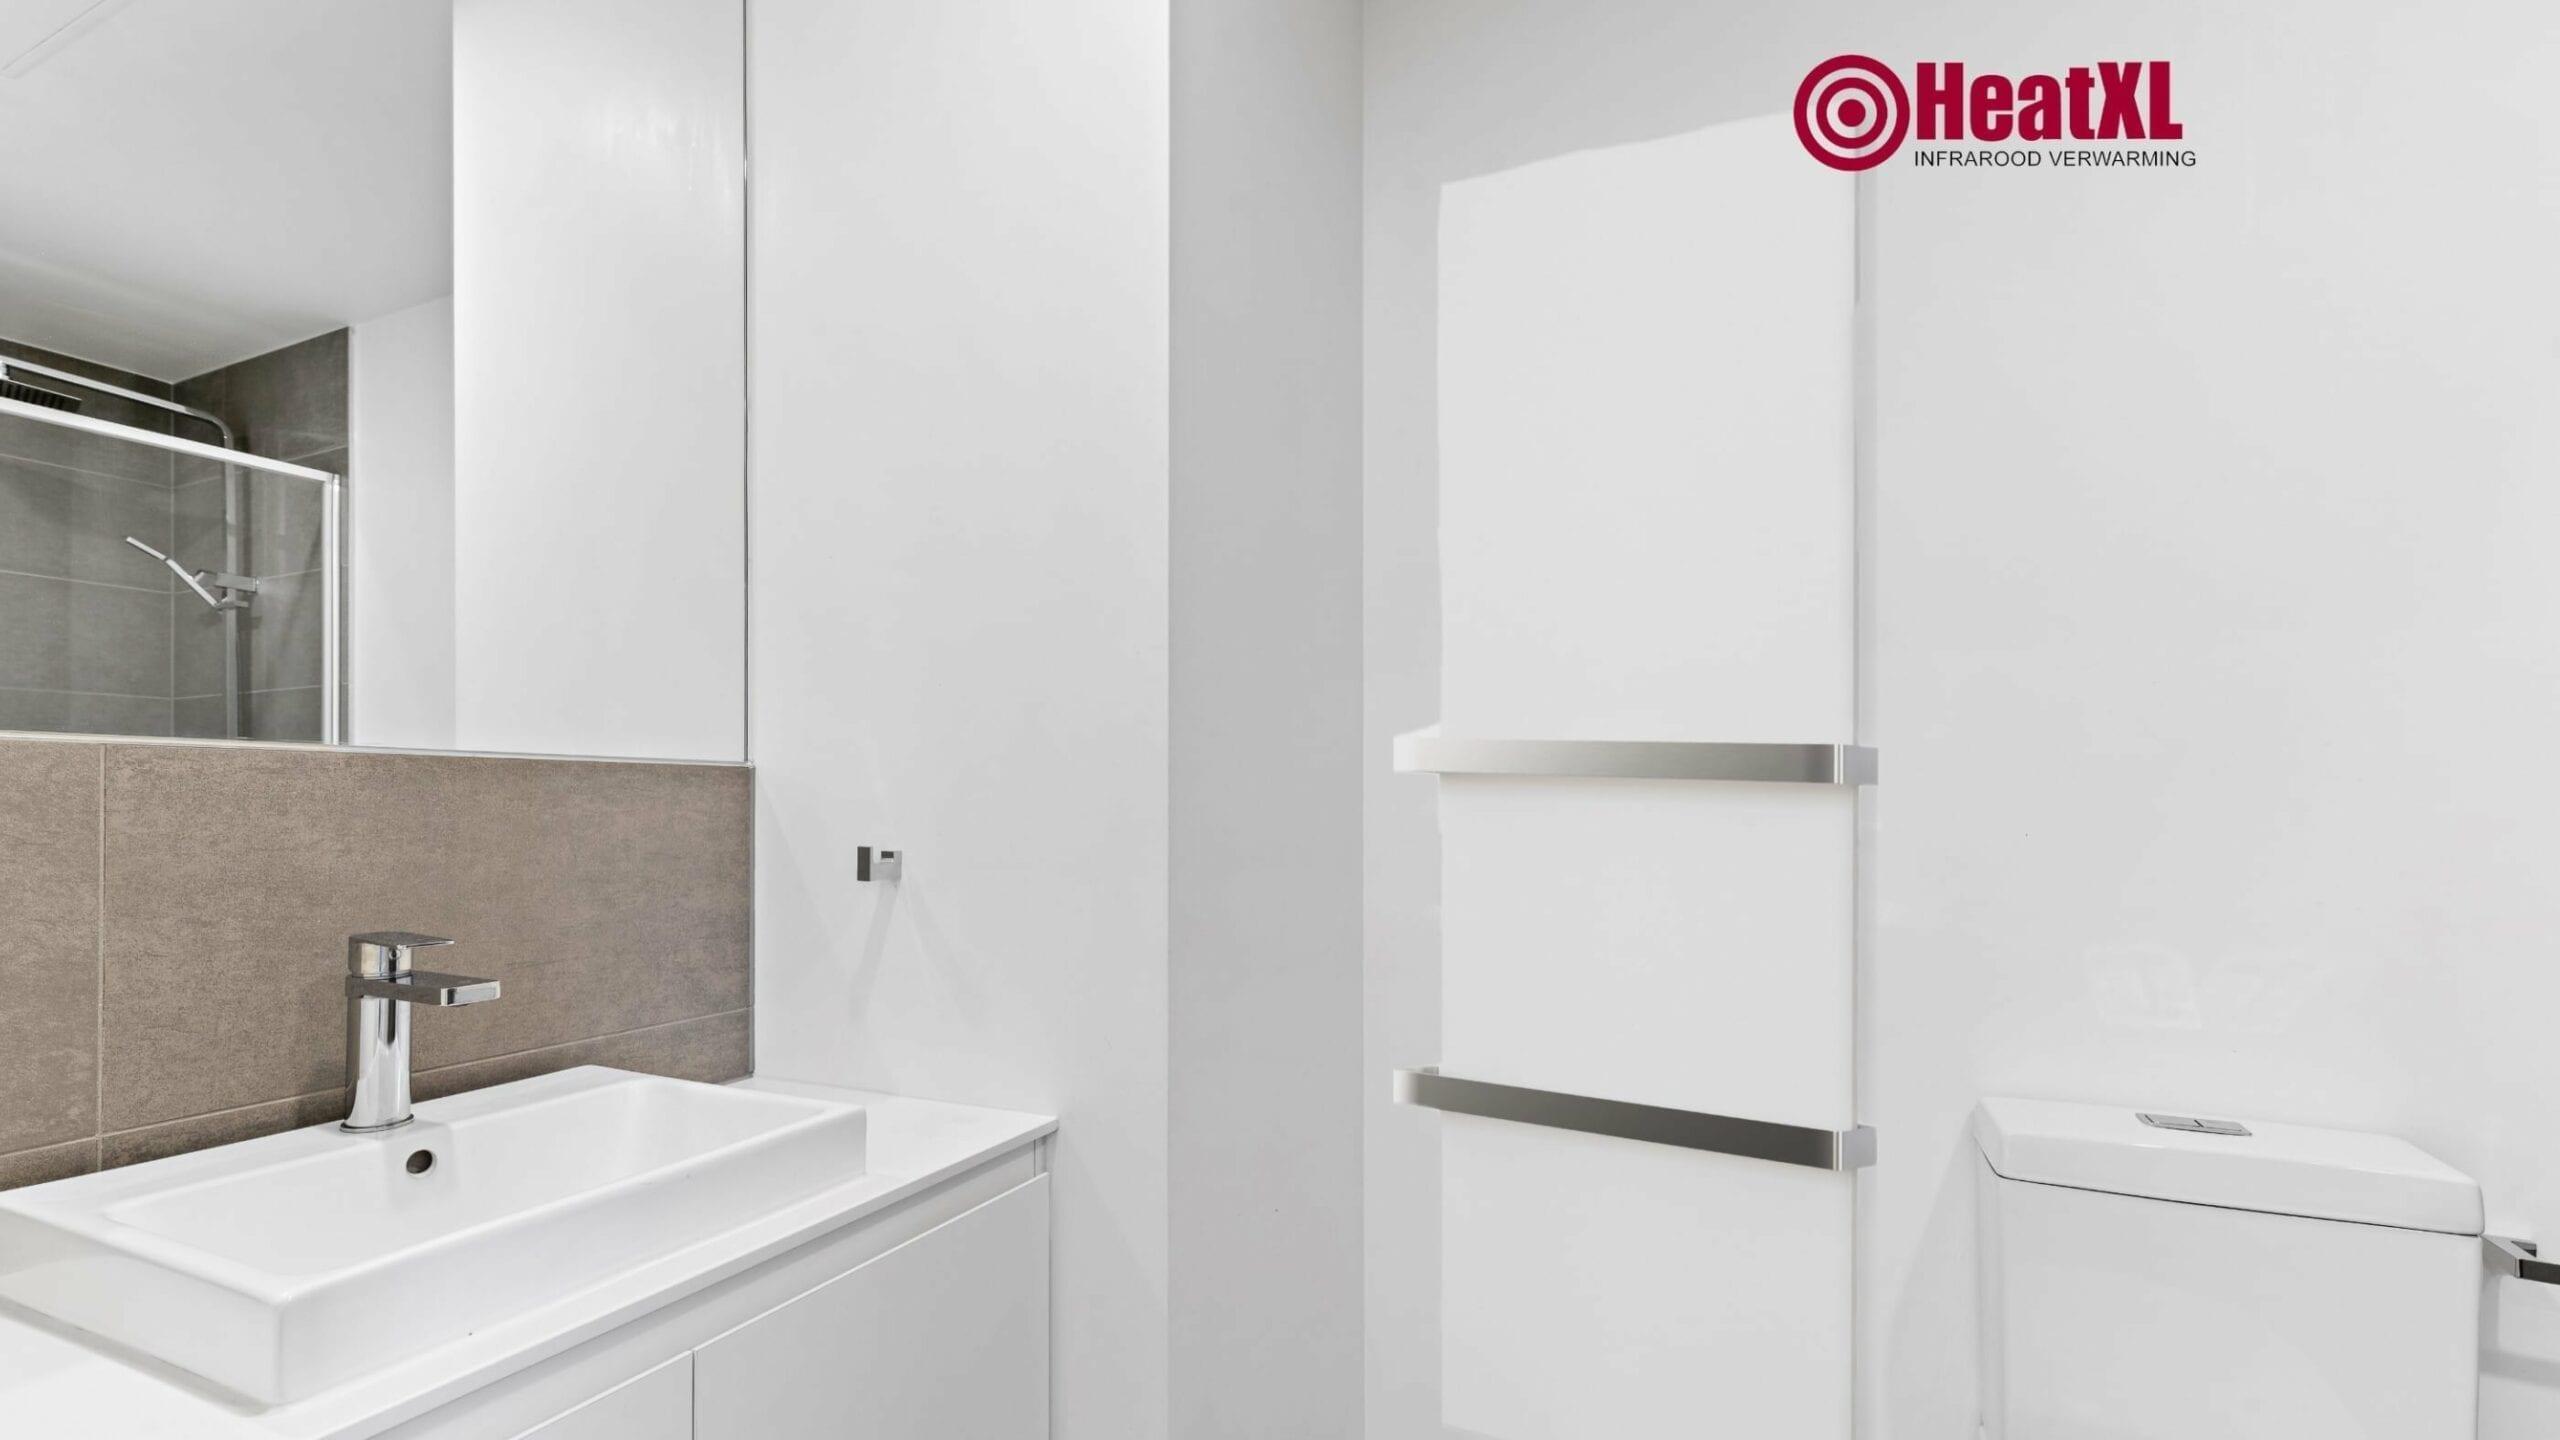 Infrarood paneel infrarood panelen infrarood verwarming handdoekdroger